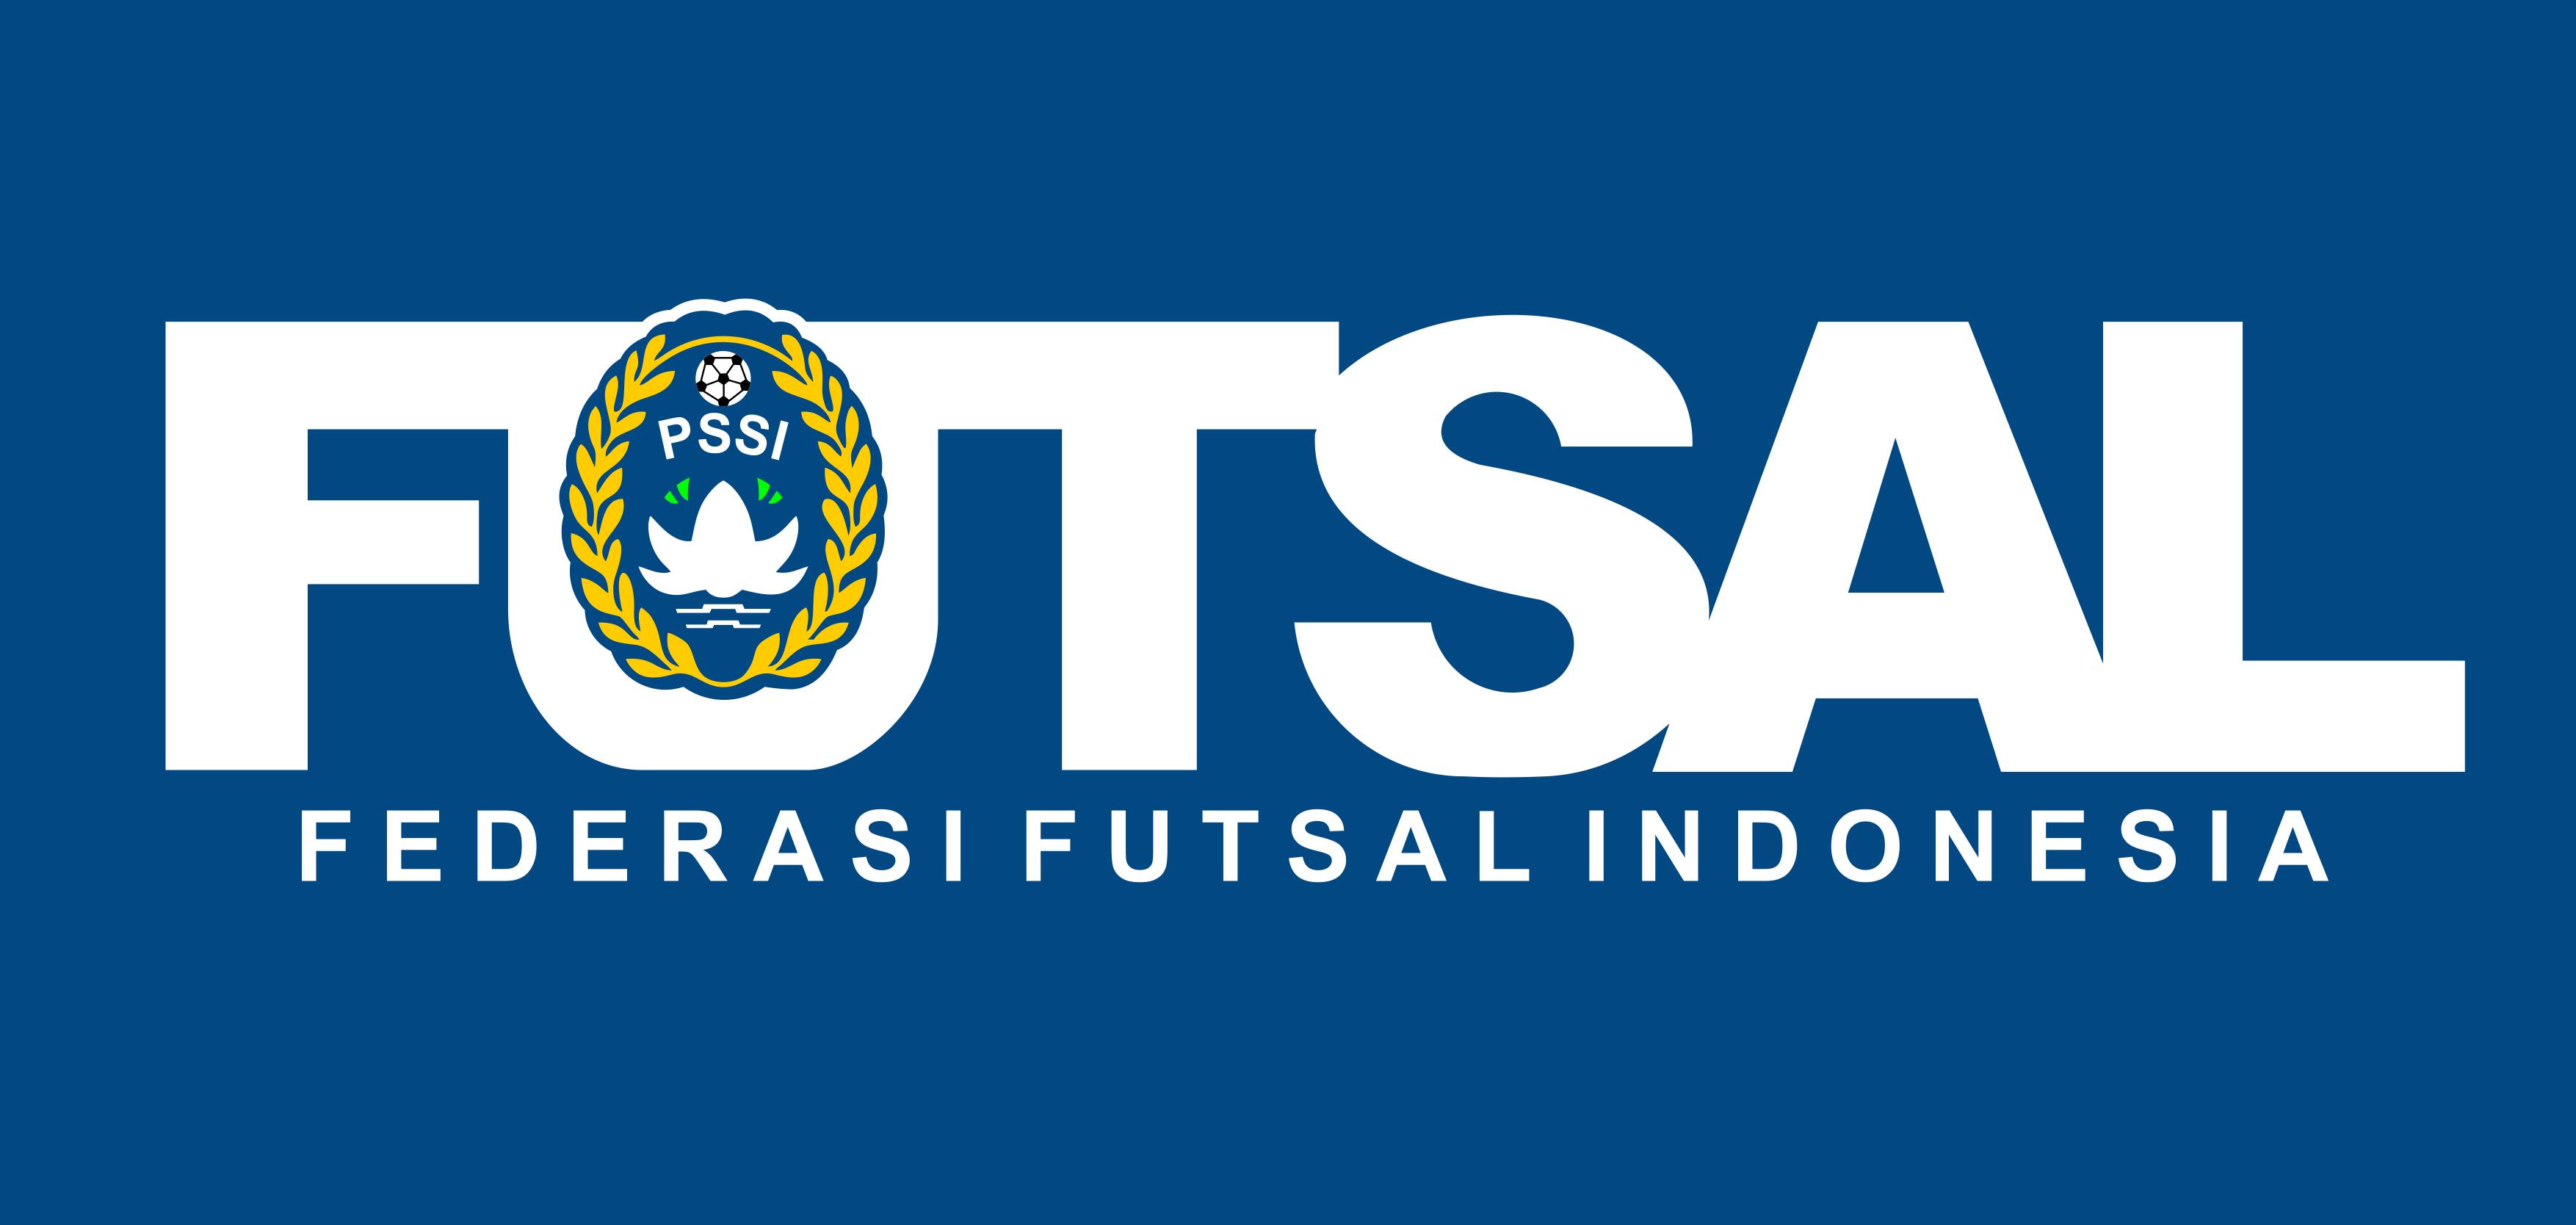 LOGO-FEDERASI-FUTSAL-INDONESIA-BIRU